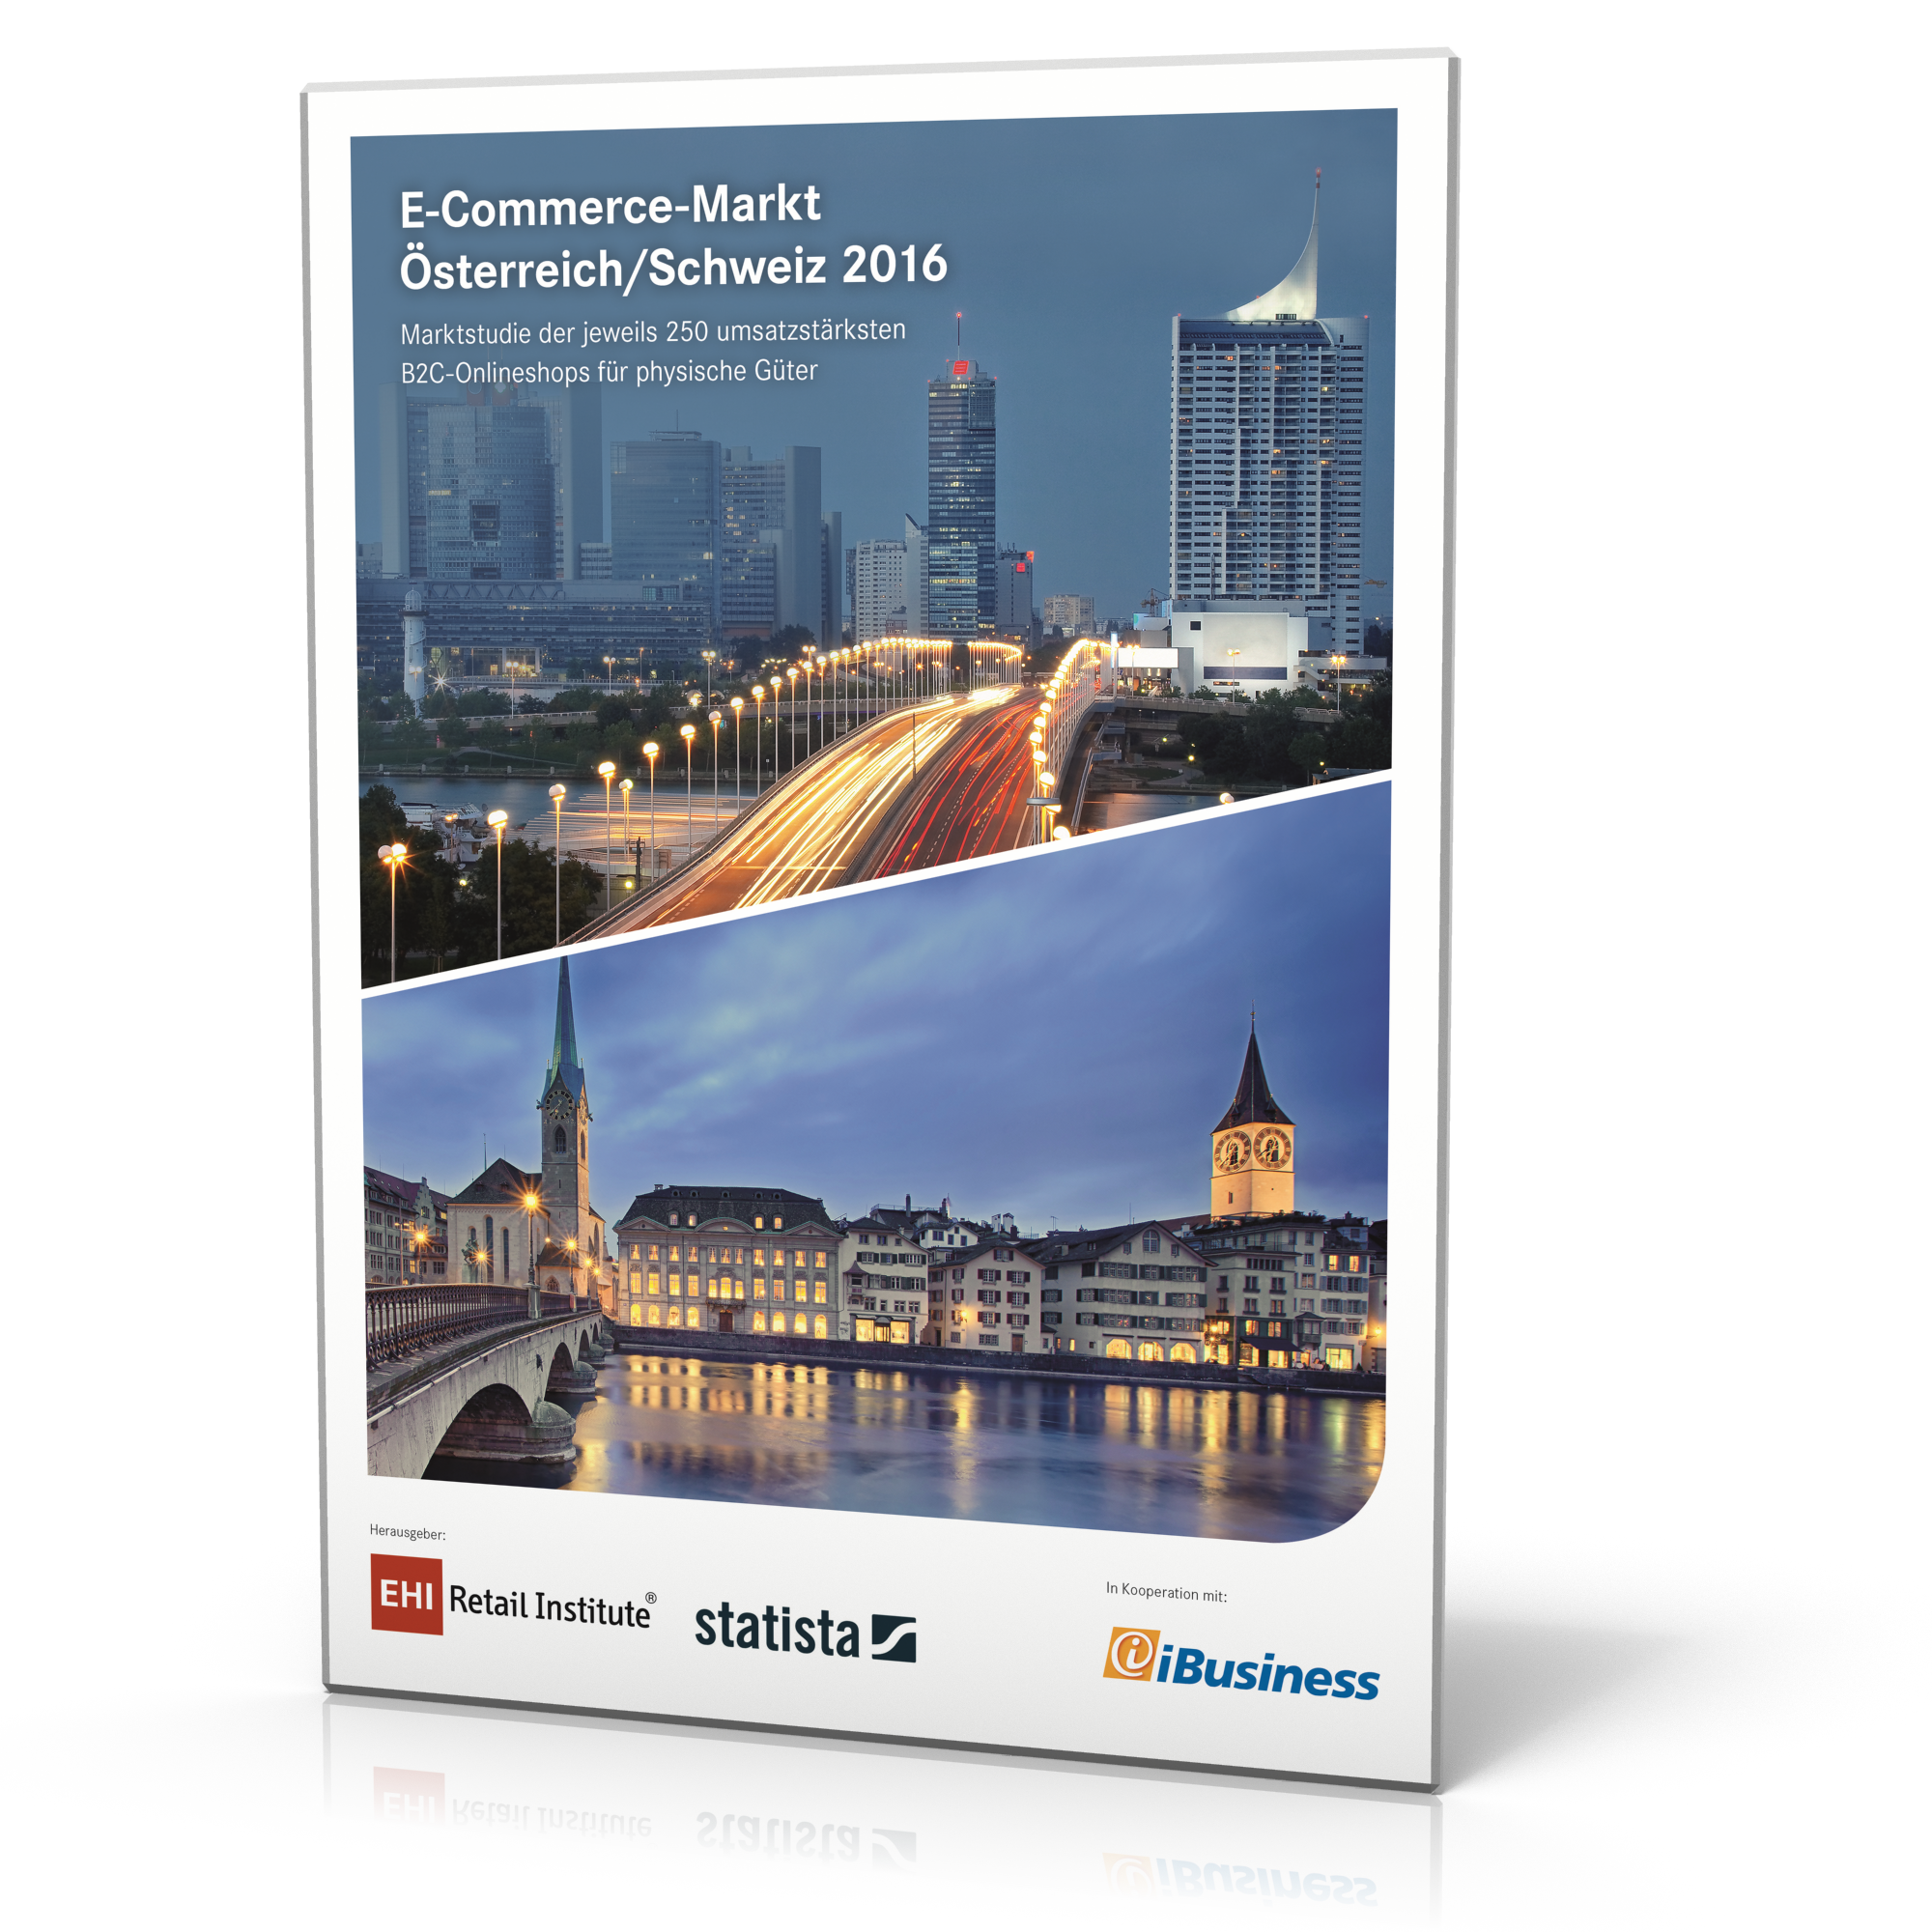 E-Commerce market Austria/Switzerland 2016